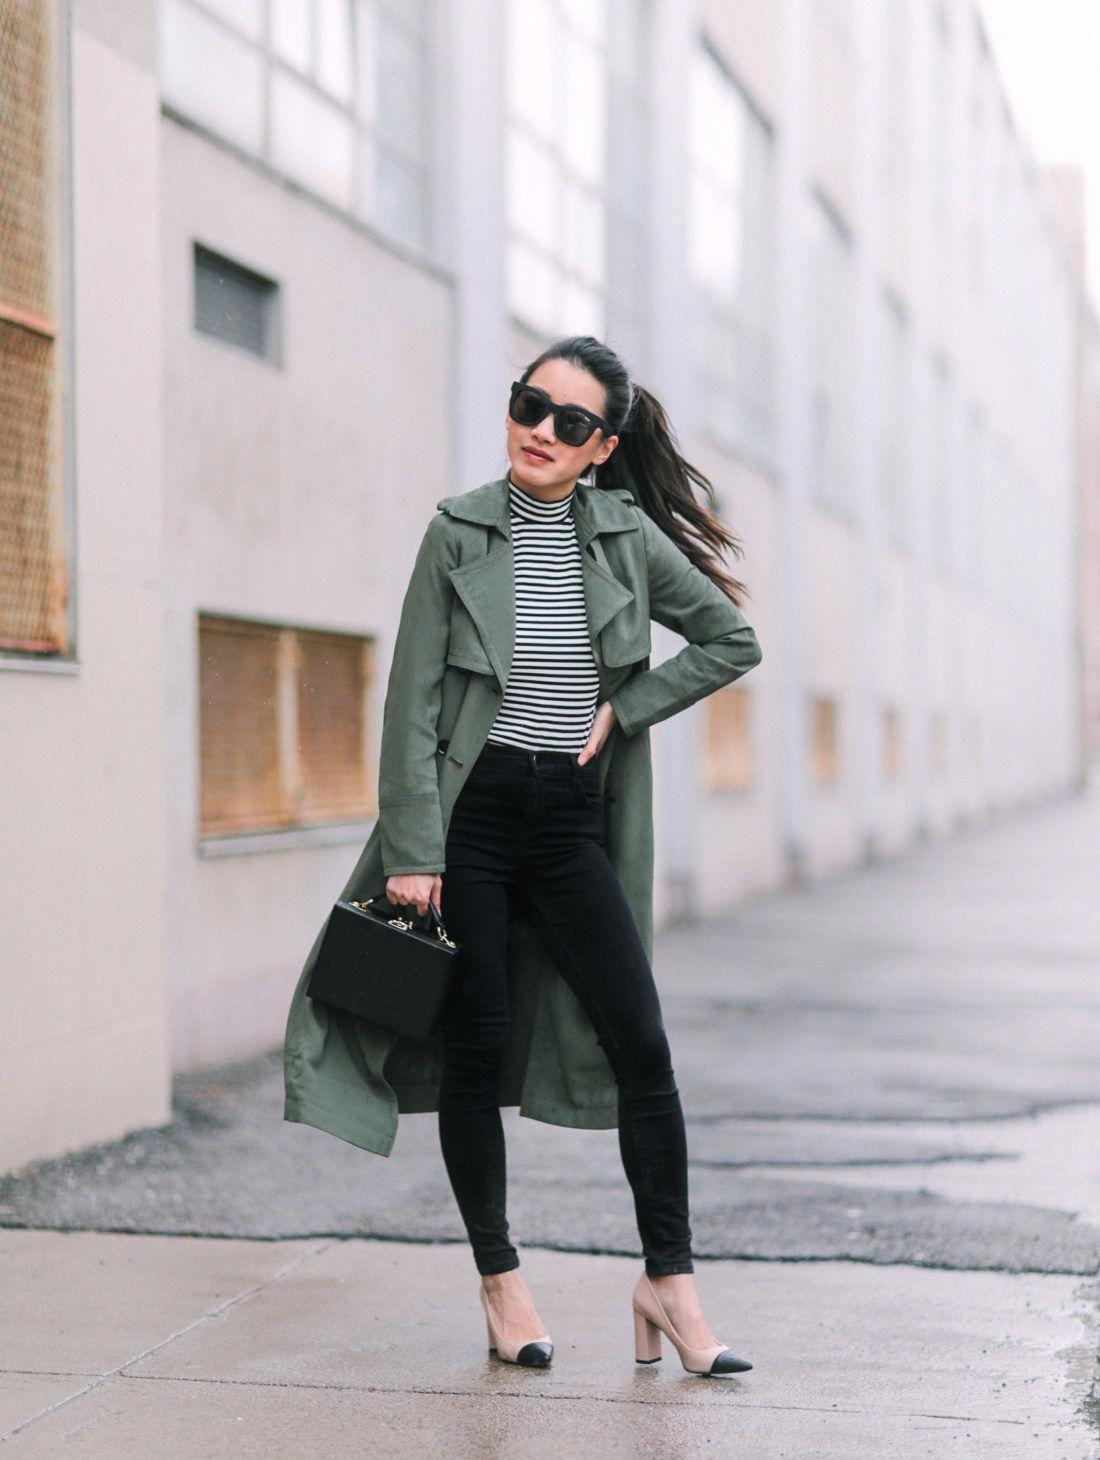 work outfits ideas workoutfits | legere arbeitskleidung